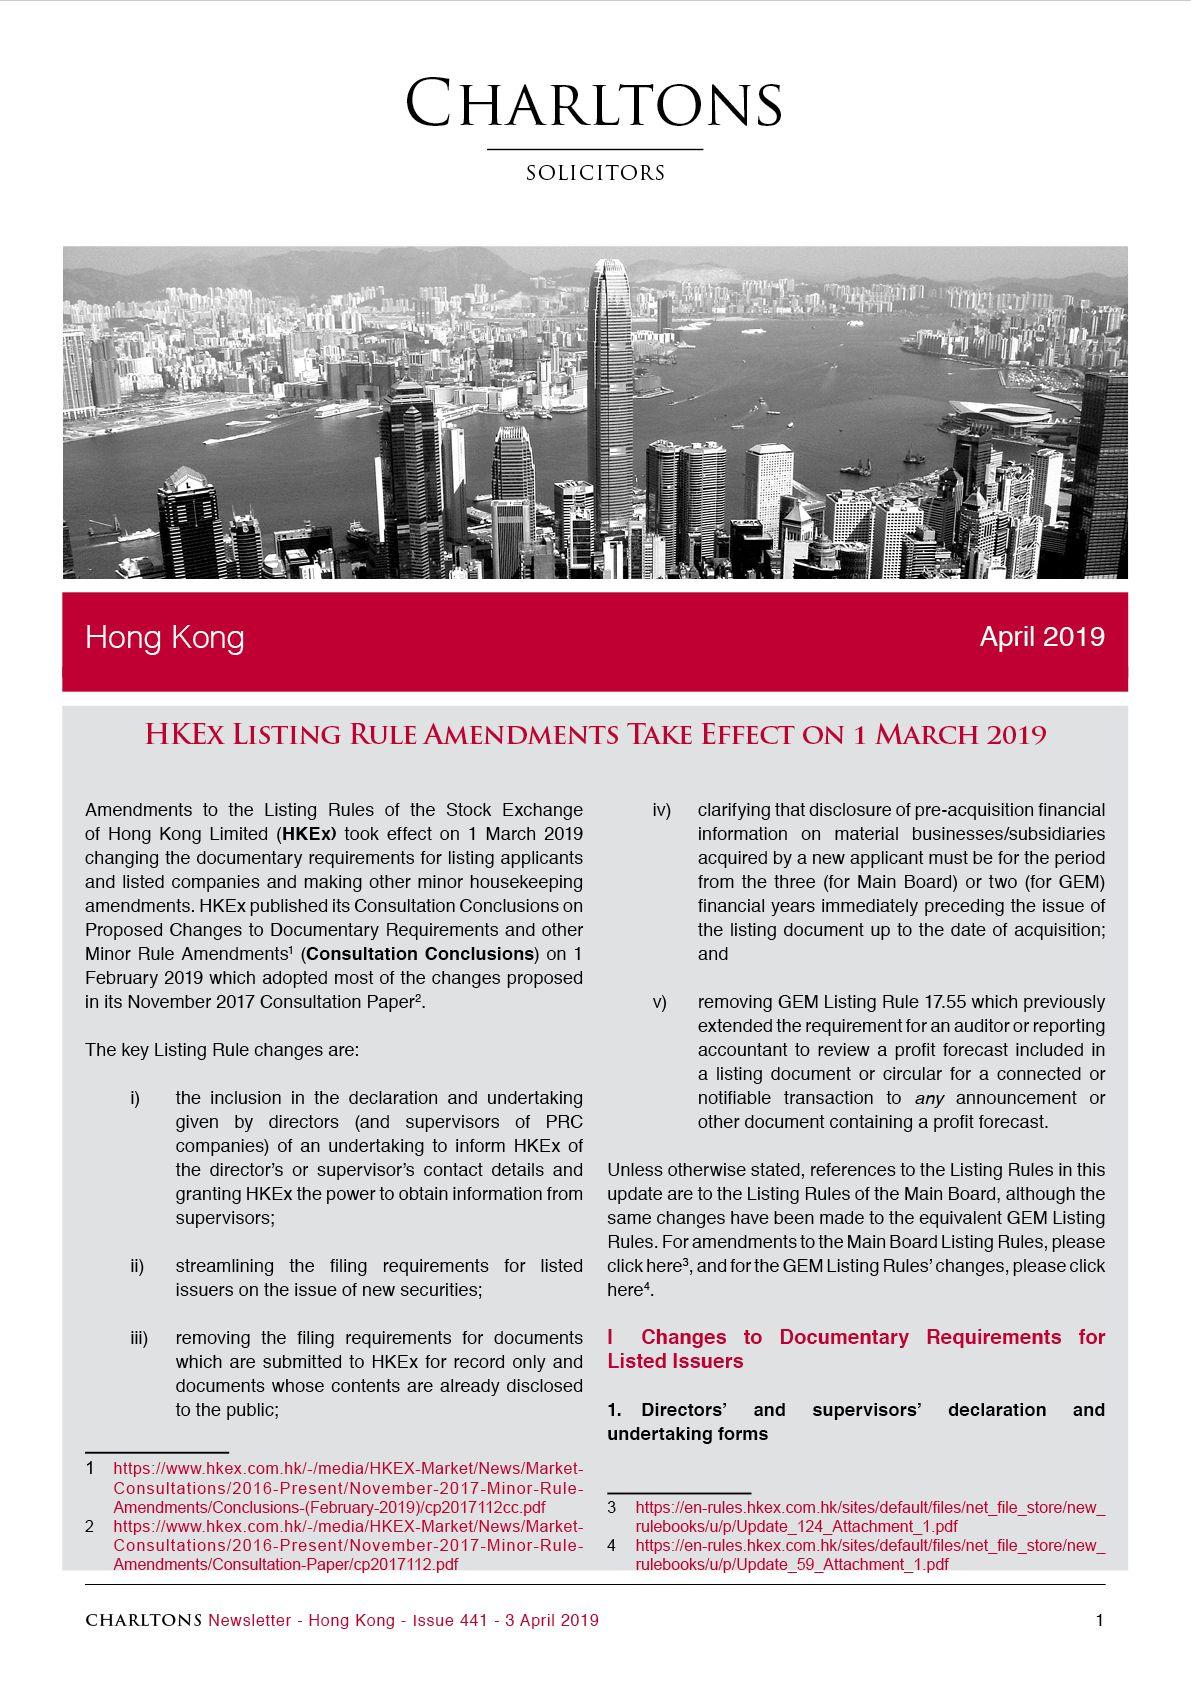 HKEx Listing Rule Amendments Take Effect on 1 March 2019